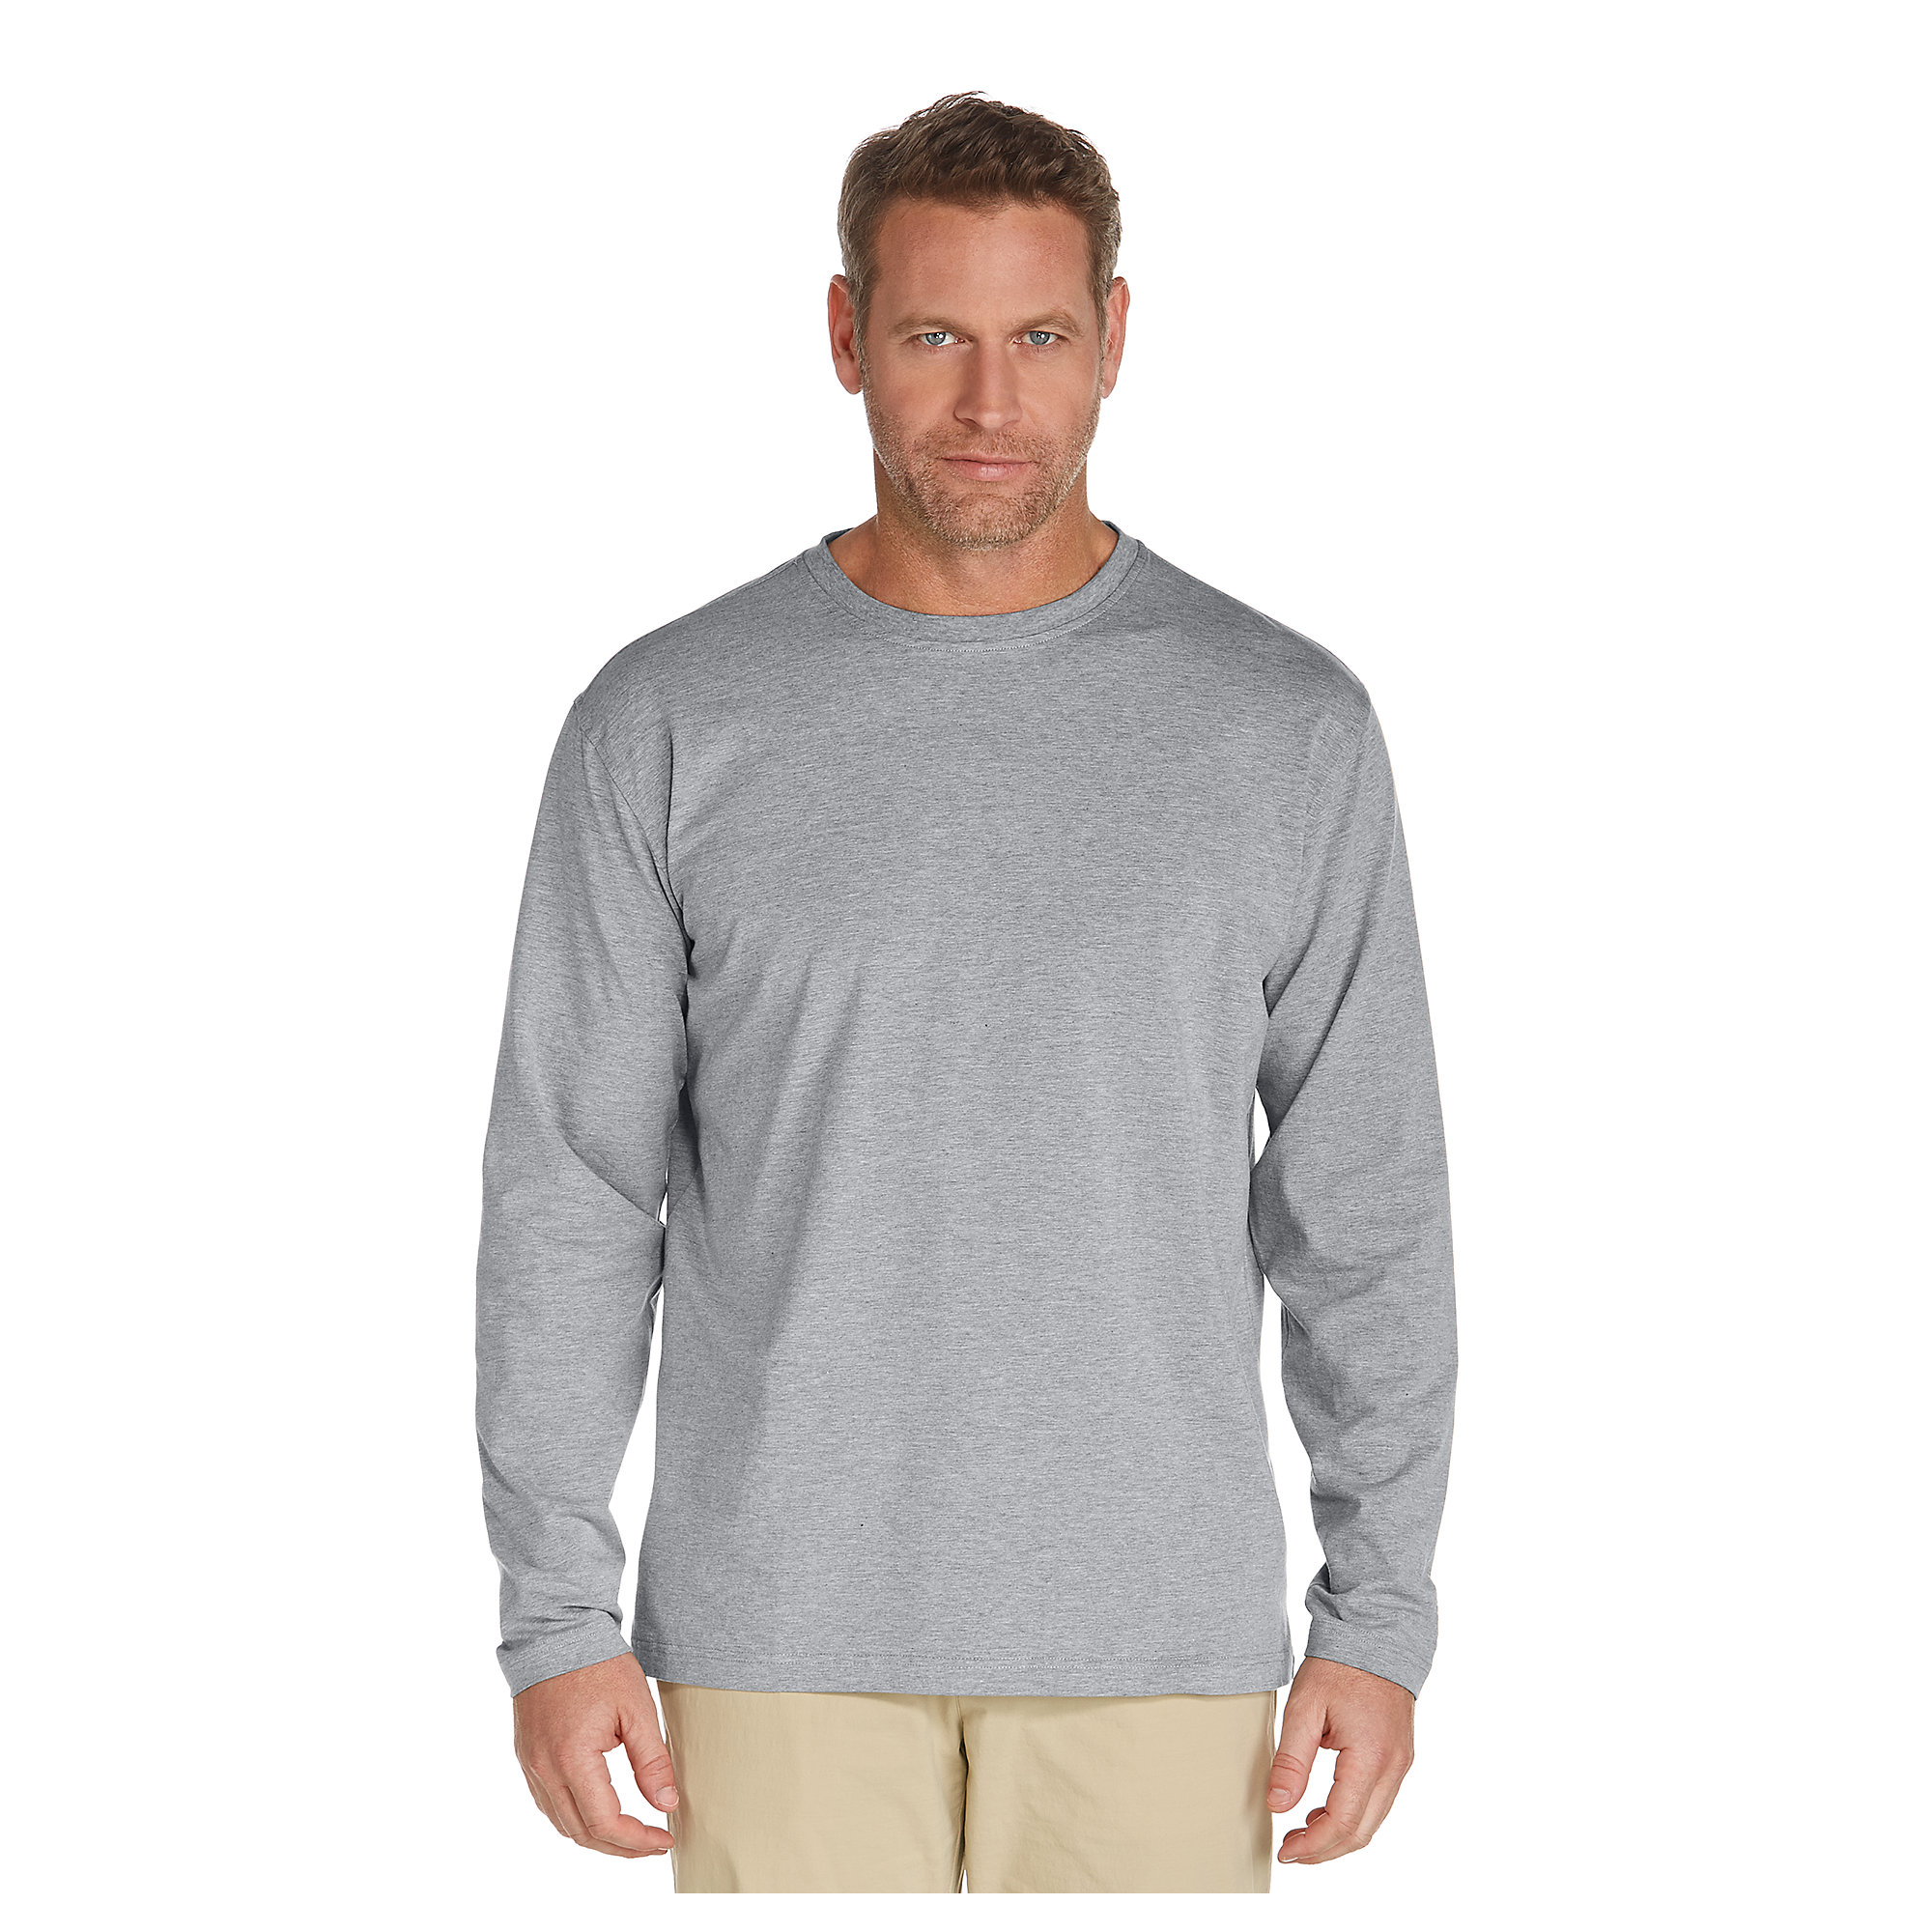 Coolibar upf 50 mens zno long sleeve t shirt sun protective for Custom sun protection shirts